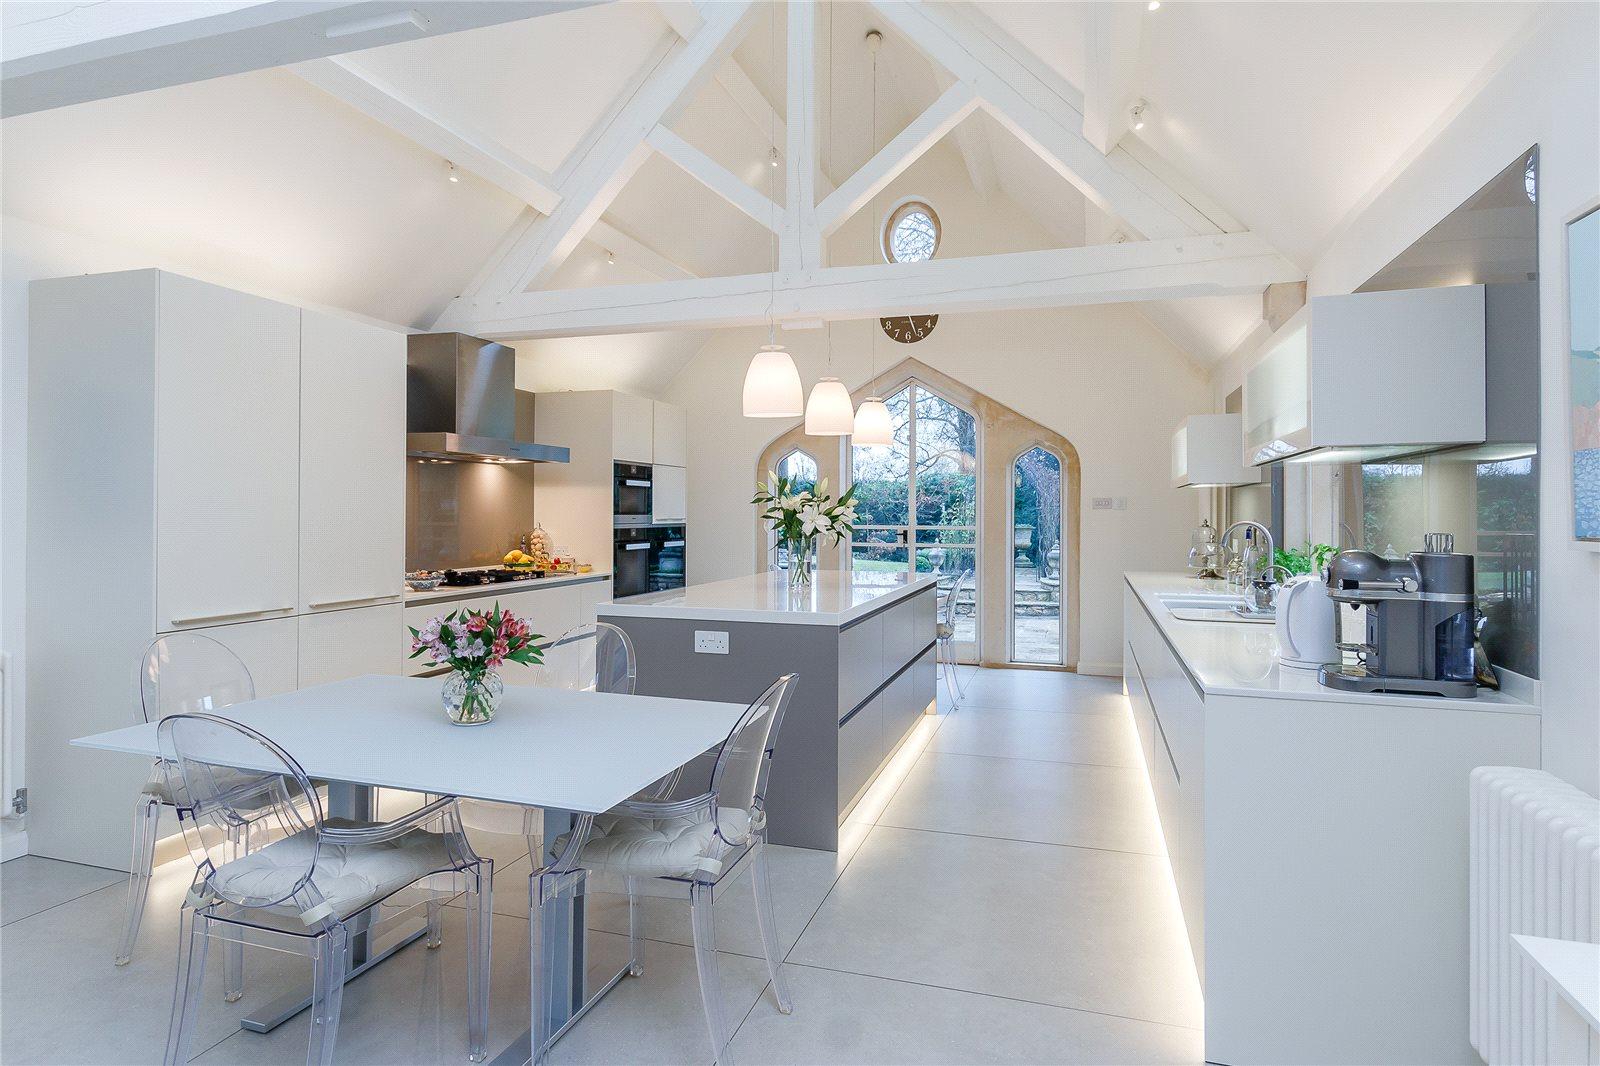 Netherton, Quenington, Cirencester, Gloucestershire, GL7: a luxury ...